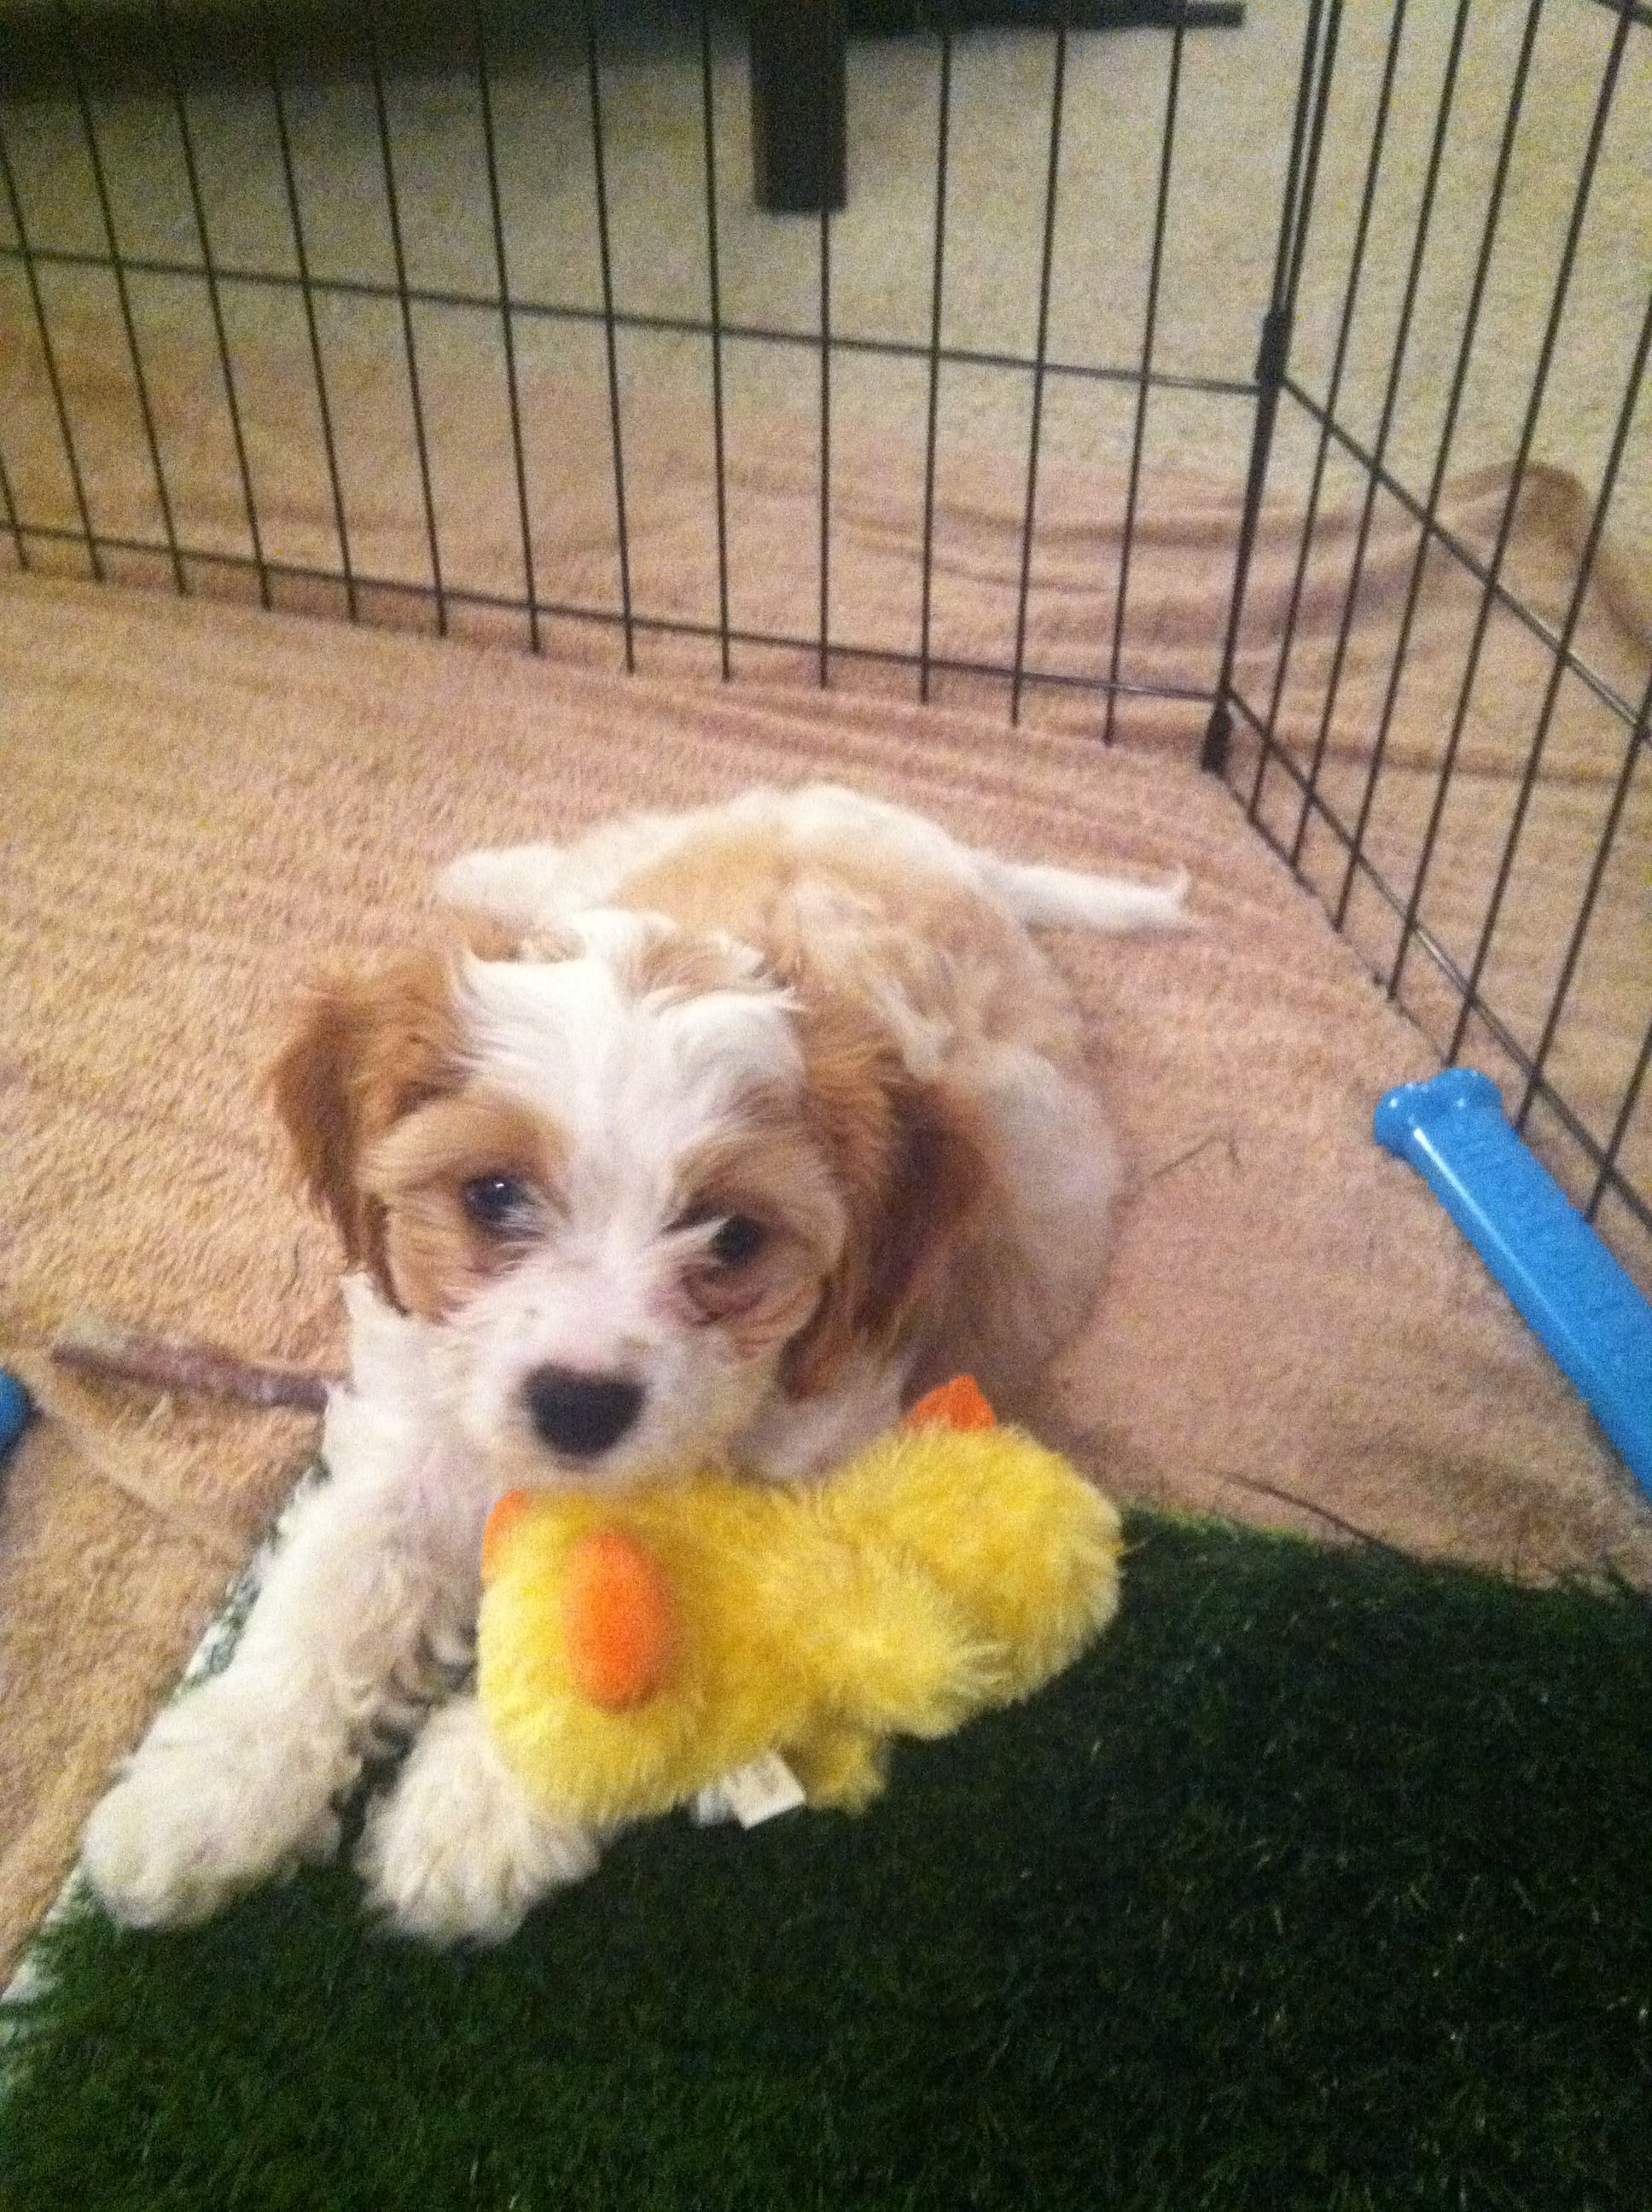 Our new Cavachon puppy, Broney!!